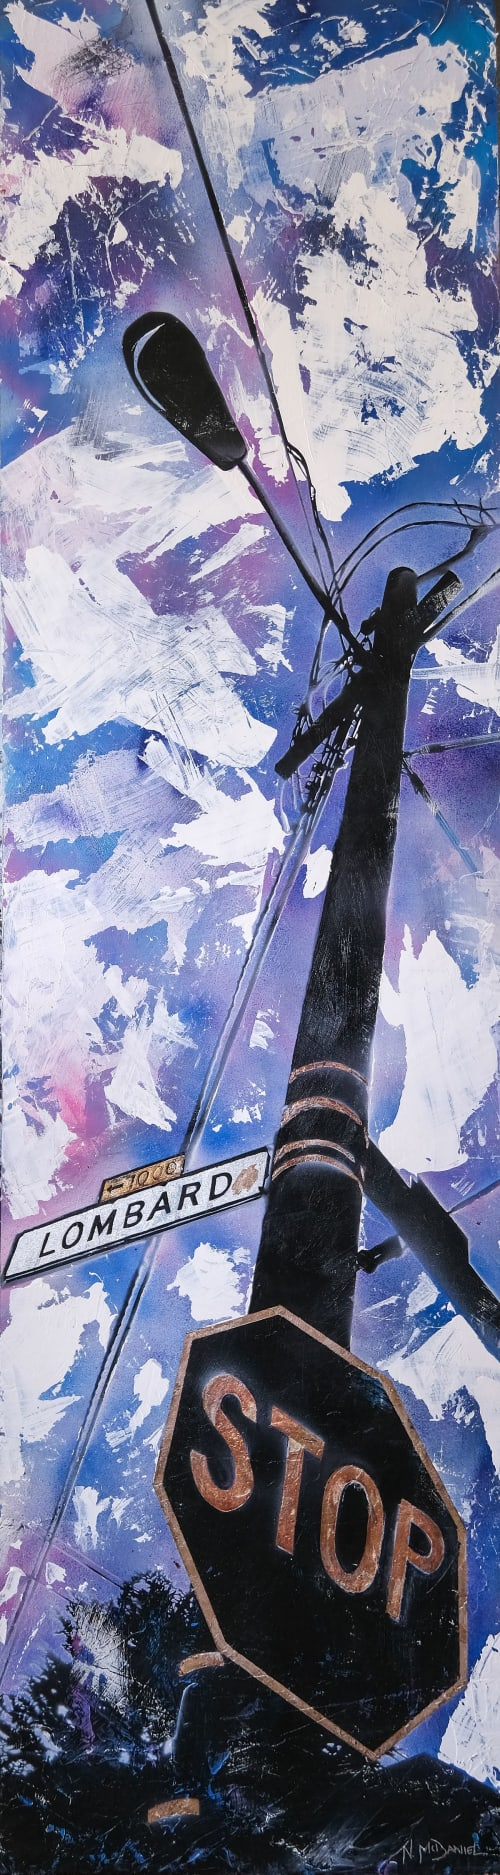 Paintings by Nichole McDaniel seen at Creator's Studio - Lombard Street